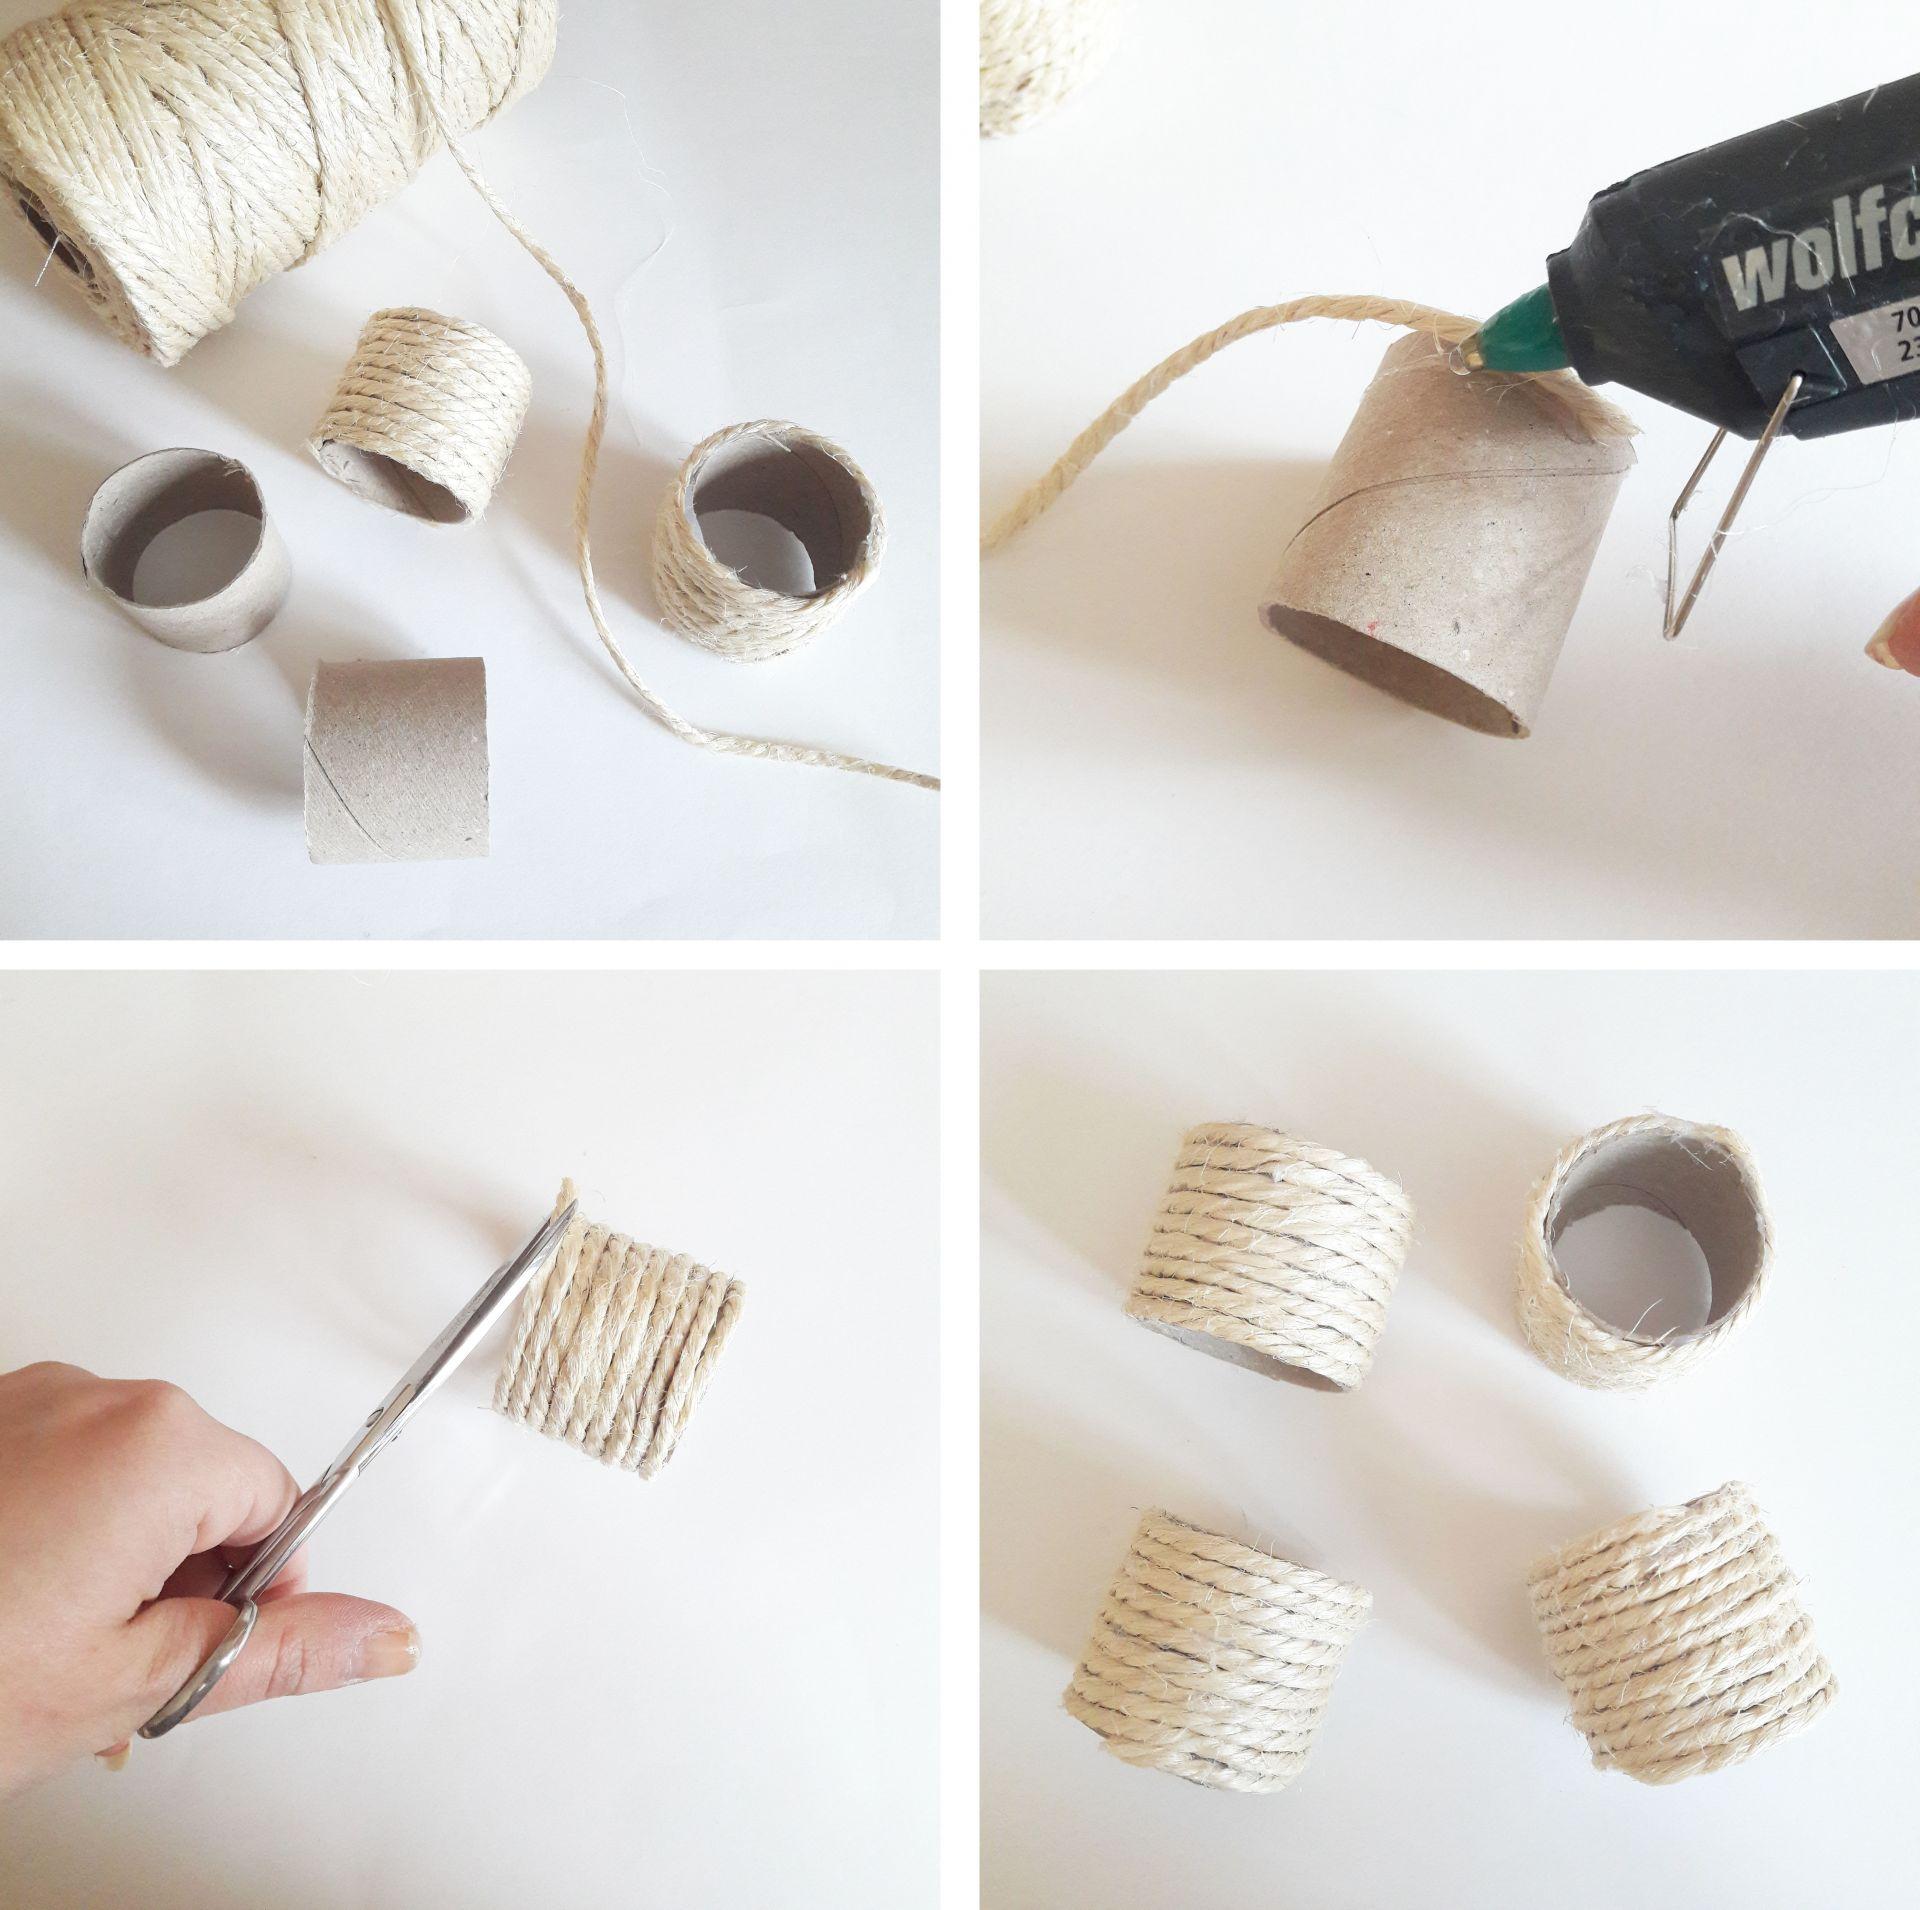 diy ronds de serviettes nude lo cia itr ma. Black Bedroom Furniture Sets. Home Design Ideas